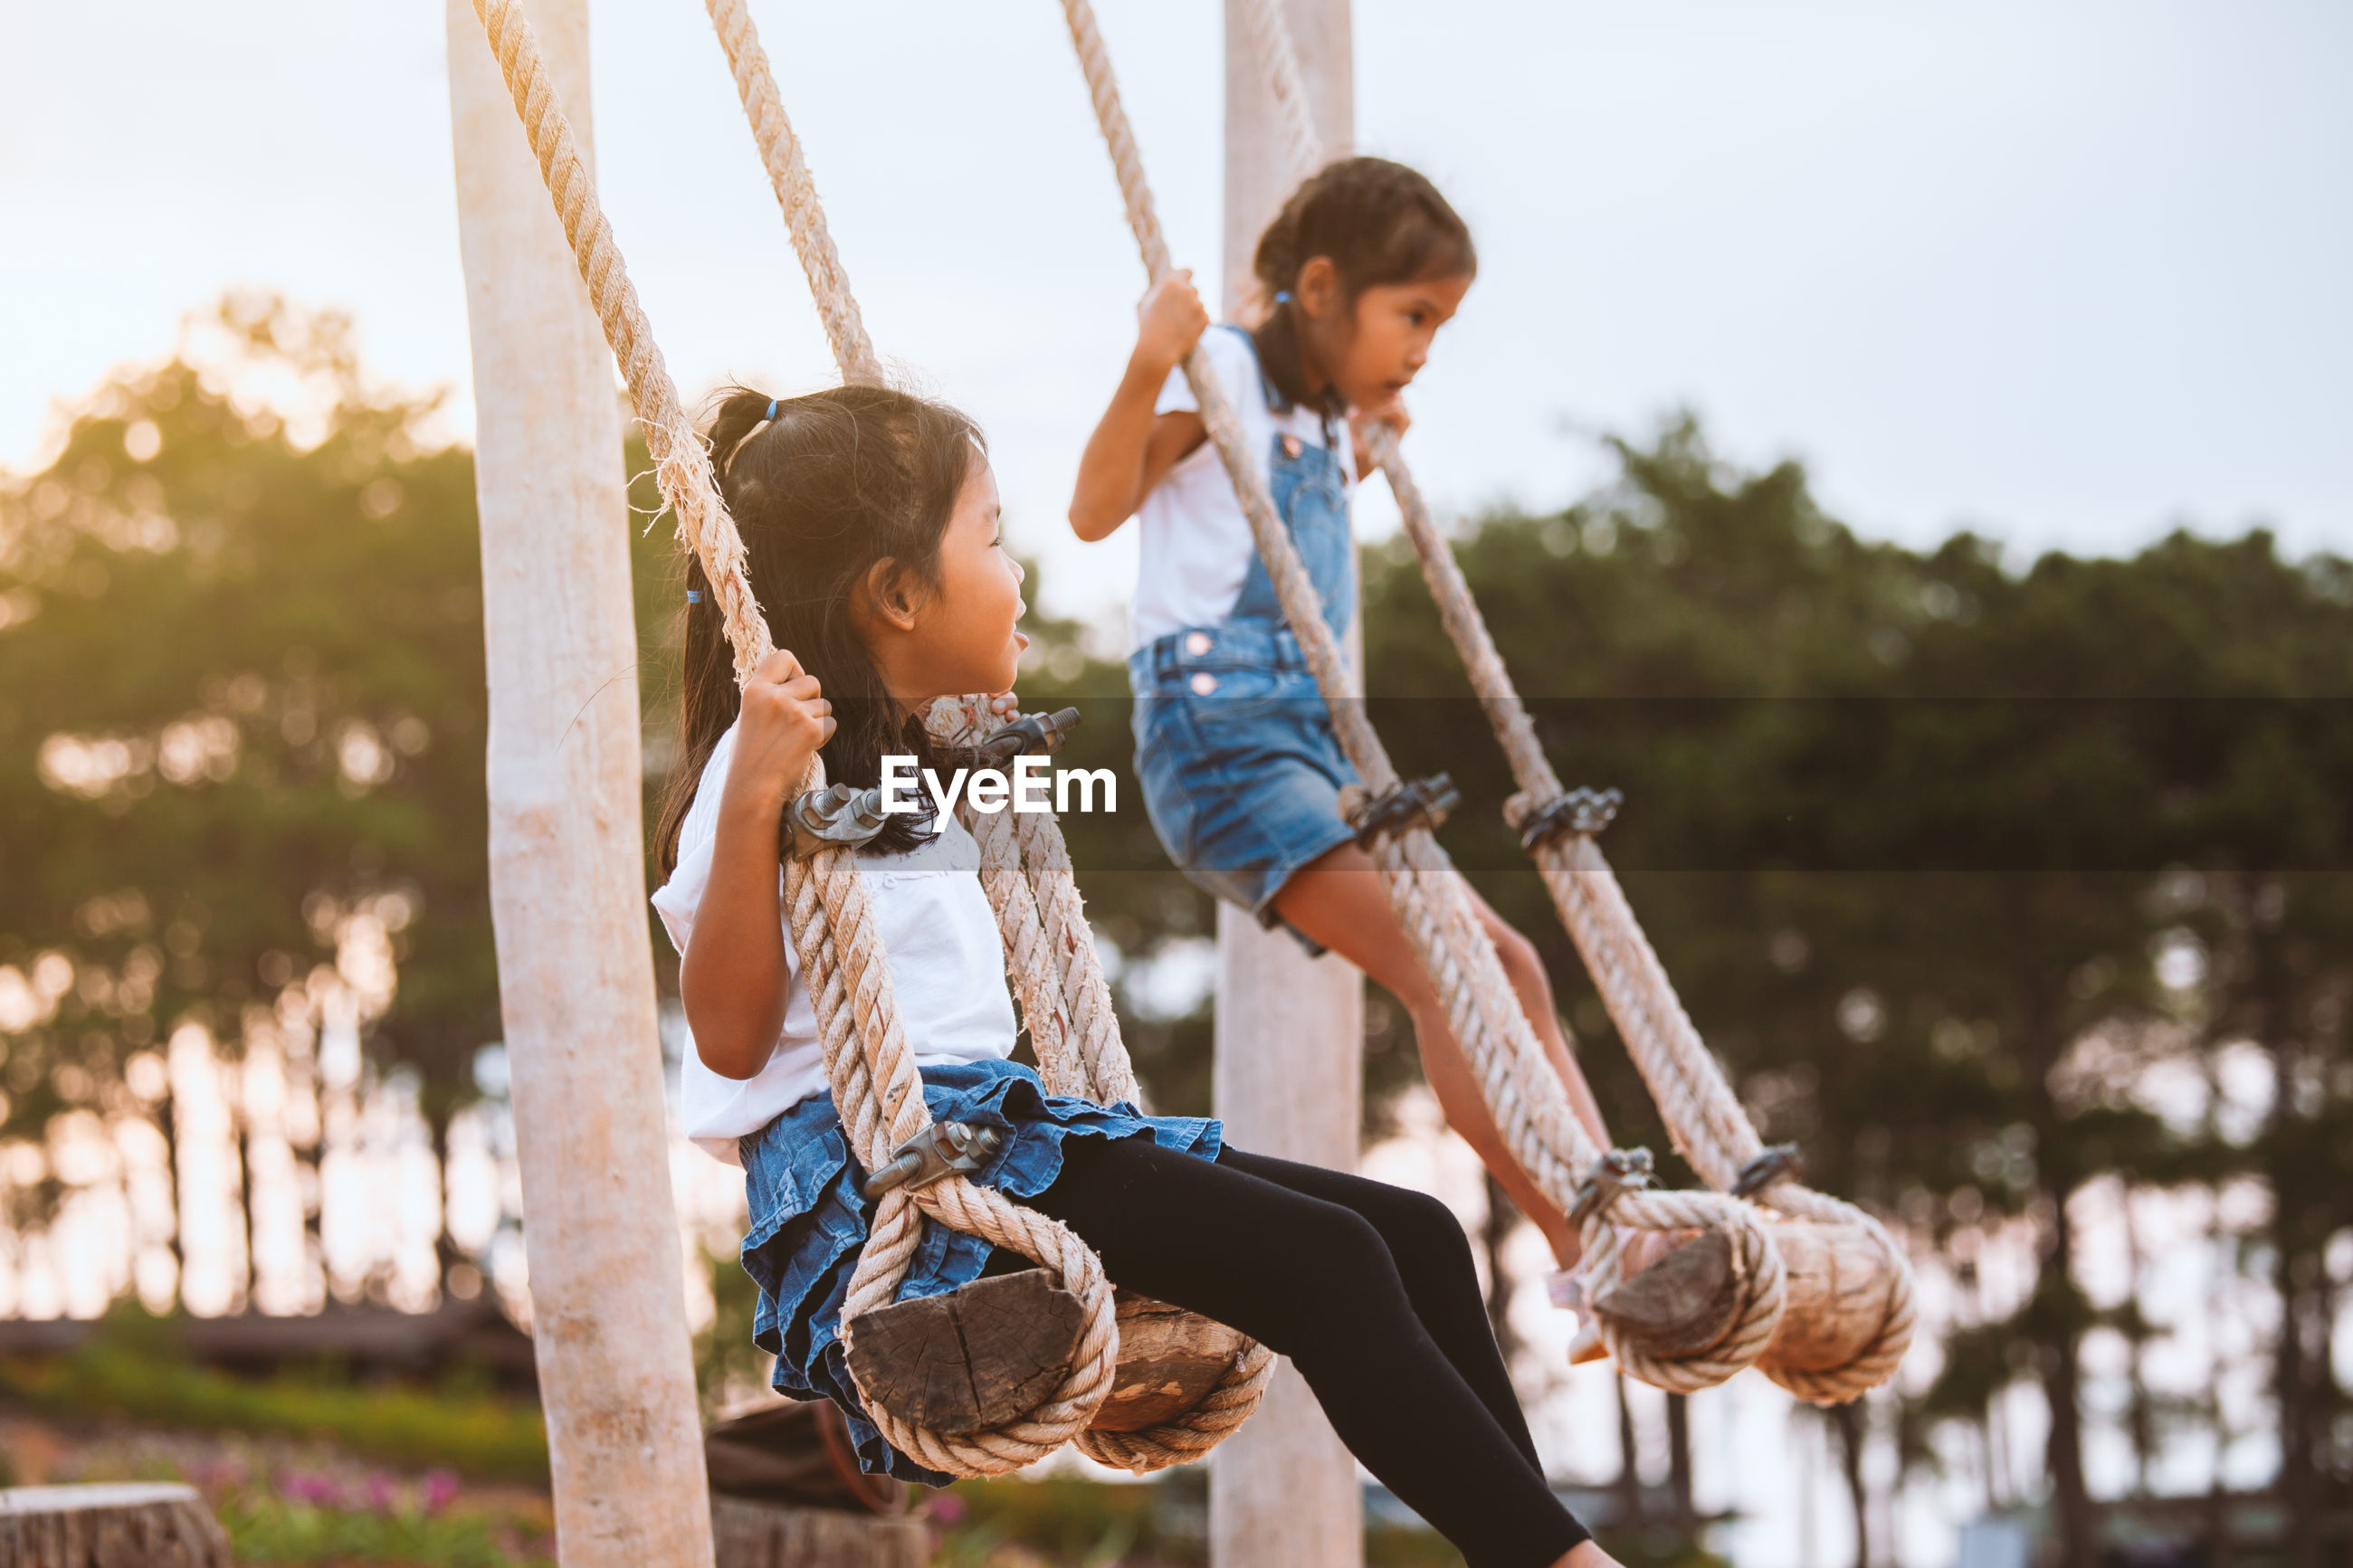 Sisters swinging at playground